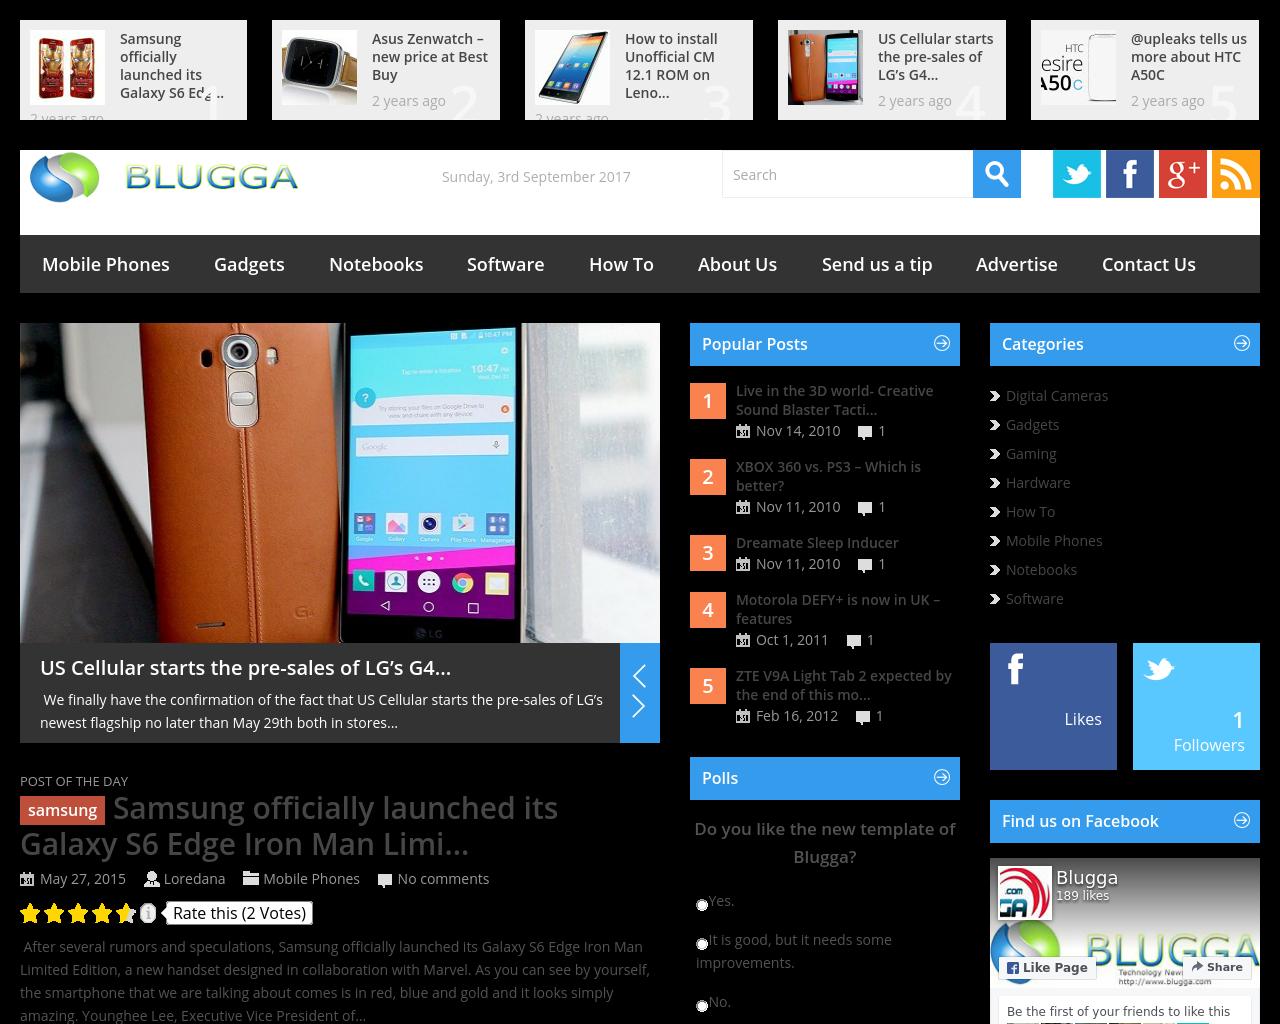 BLUGGA-Advertising-Reviews-Pricing